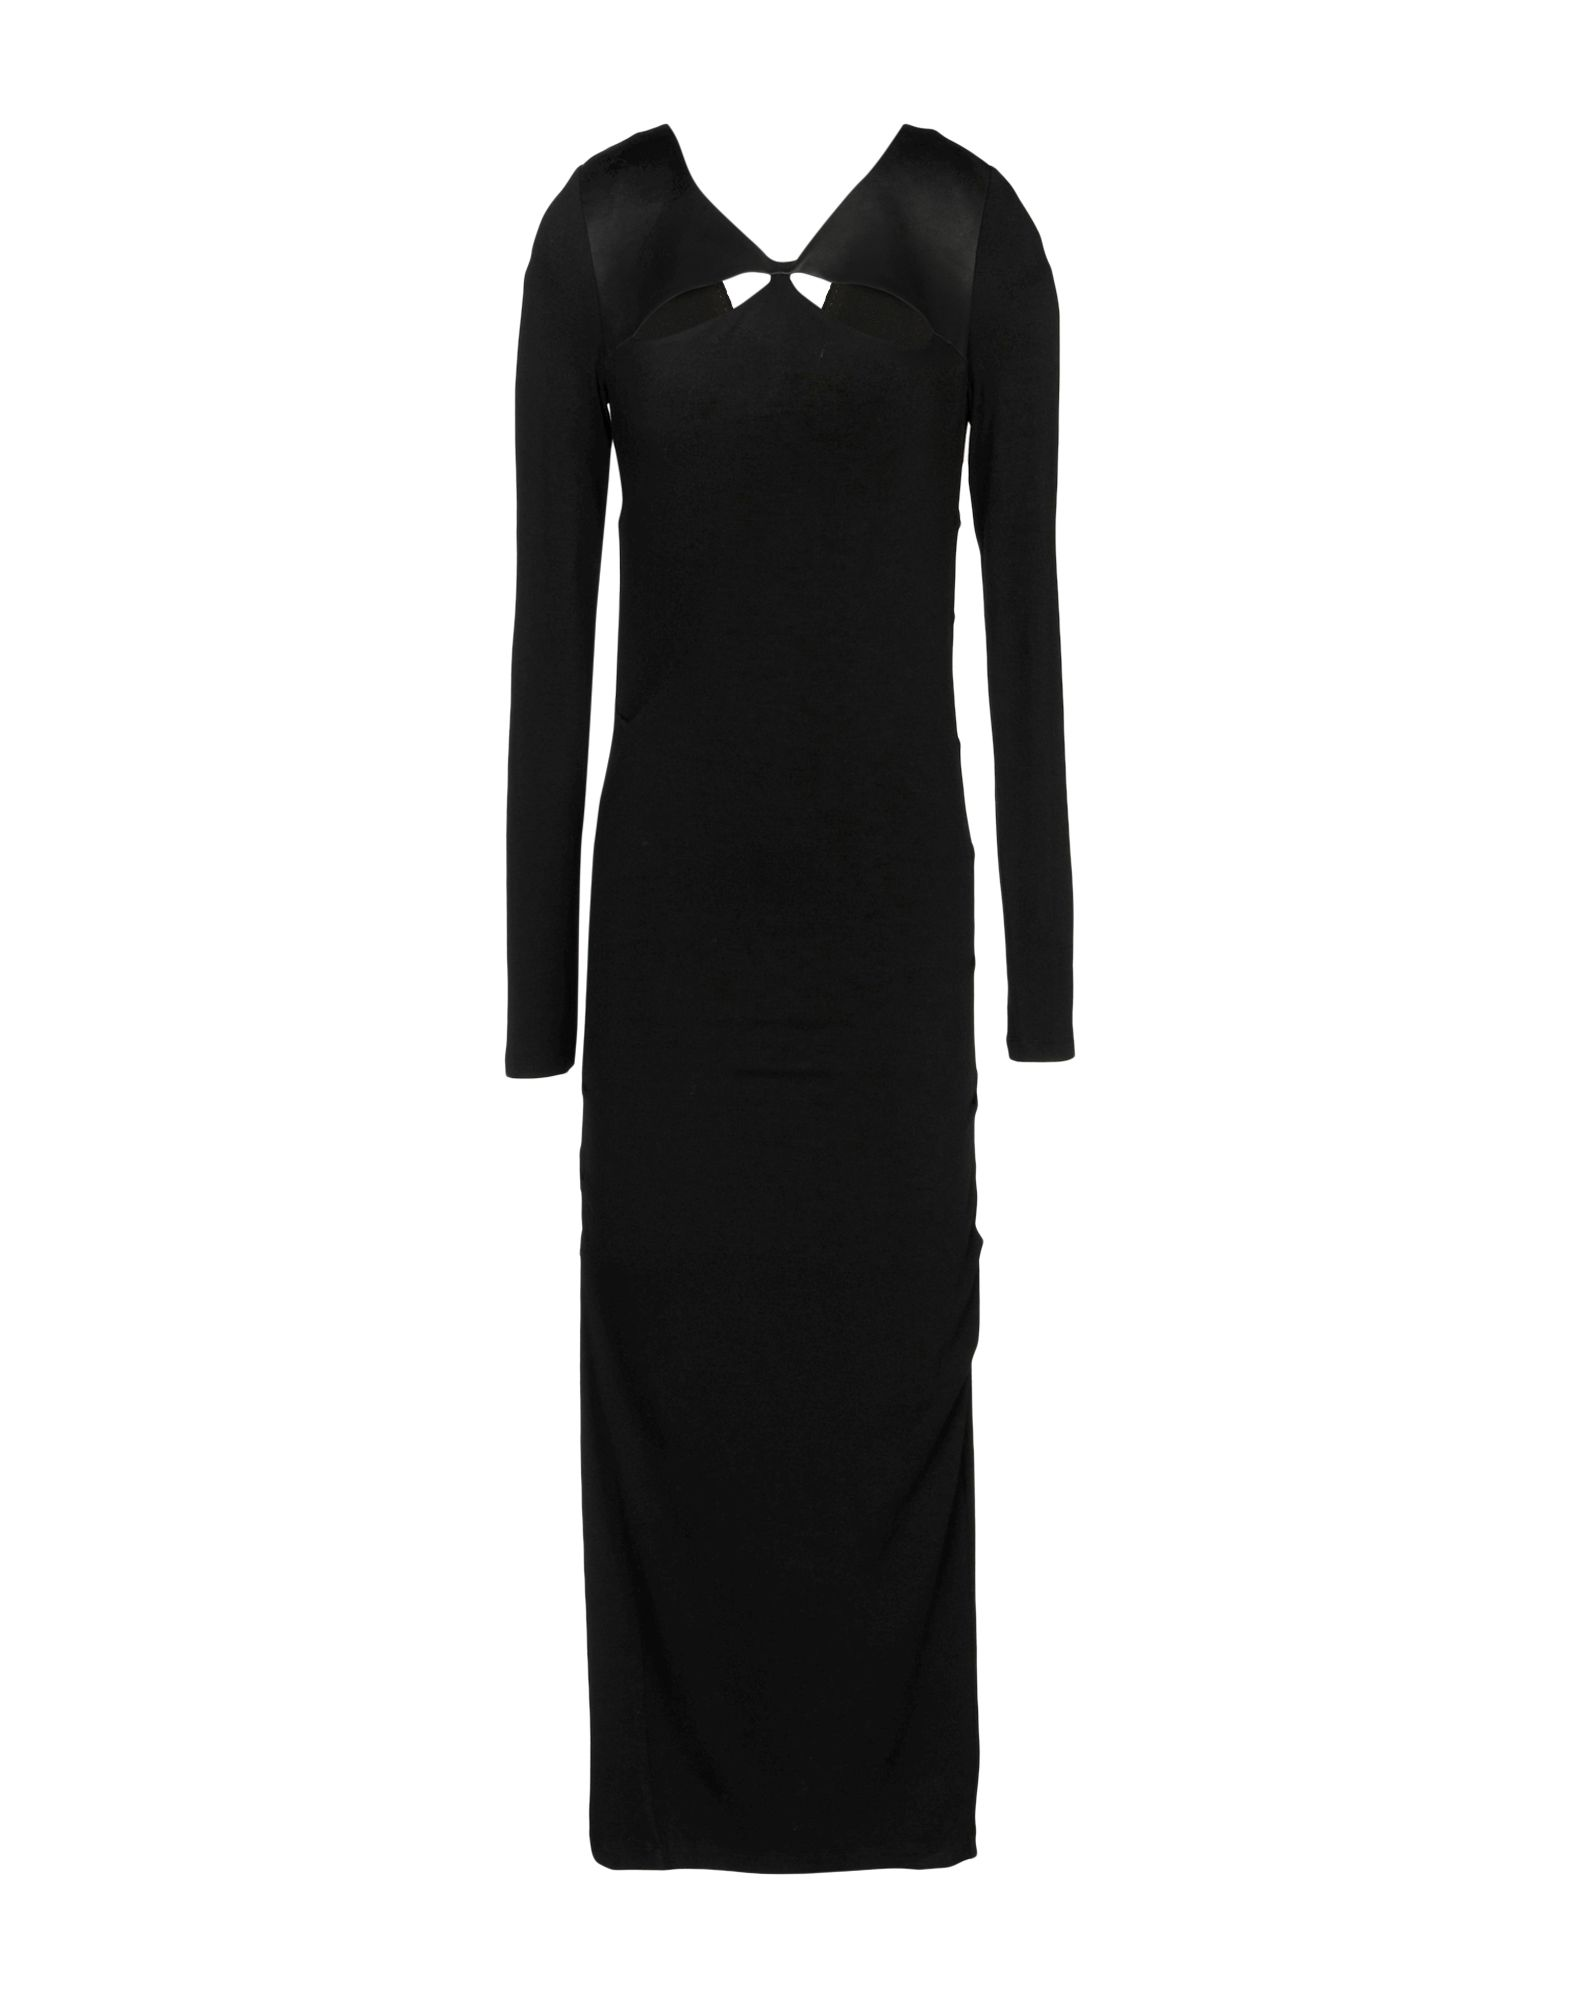 DONNA KARAN Платье длиной 3/4 цены онлайн